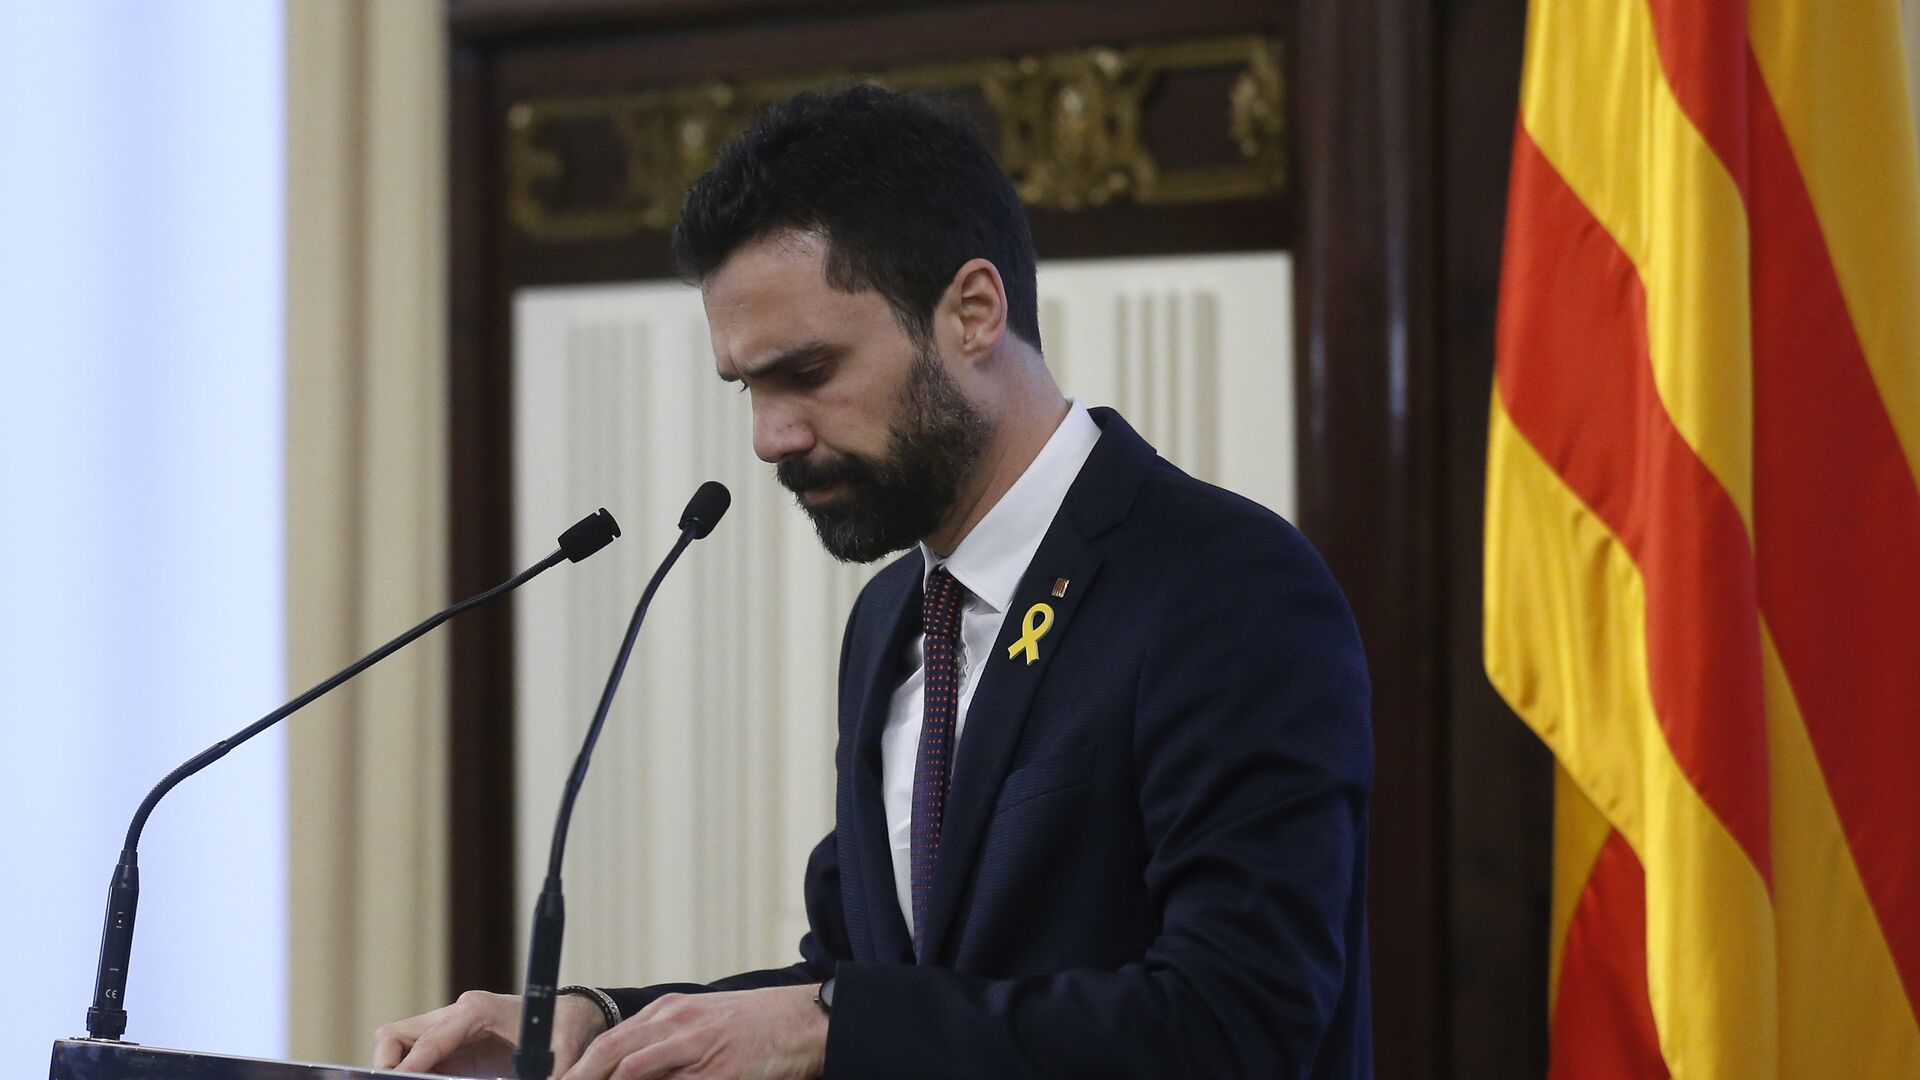 Roger Torrent, el presidente del Parlamento de Cataluña - Sputnik Mundo, 1920, 26.07.2021